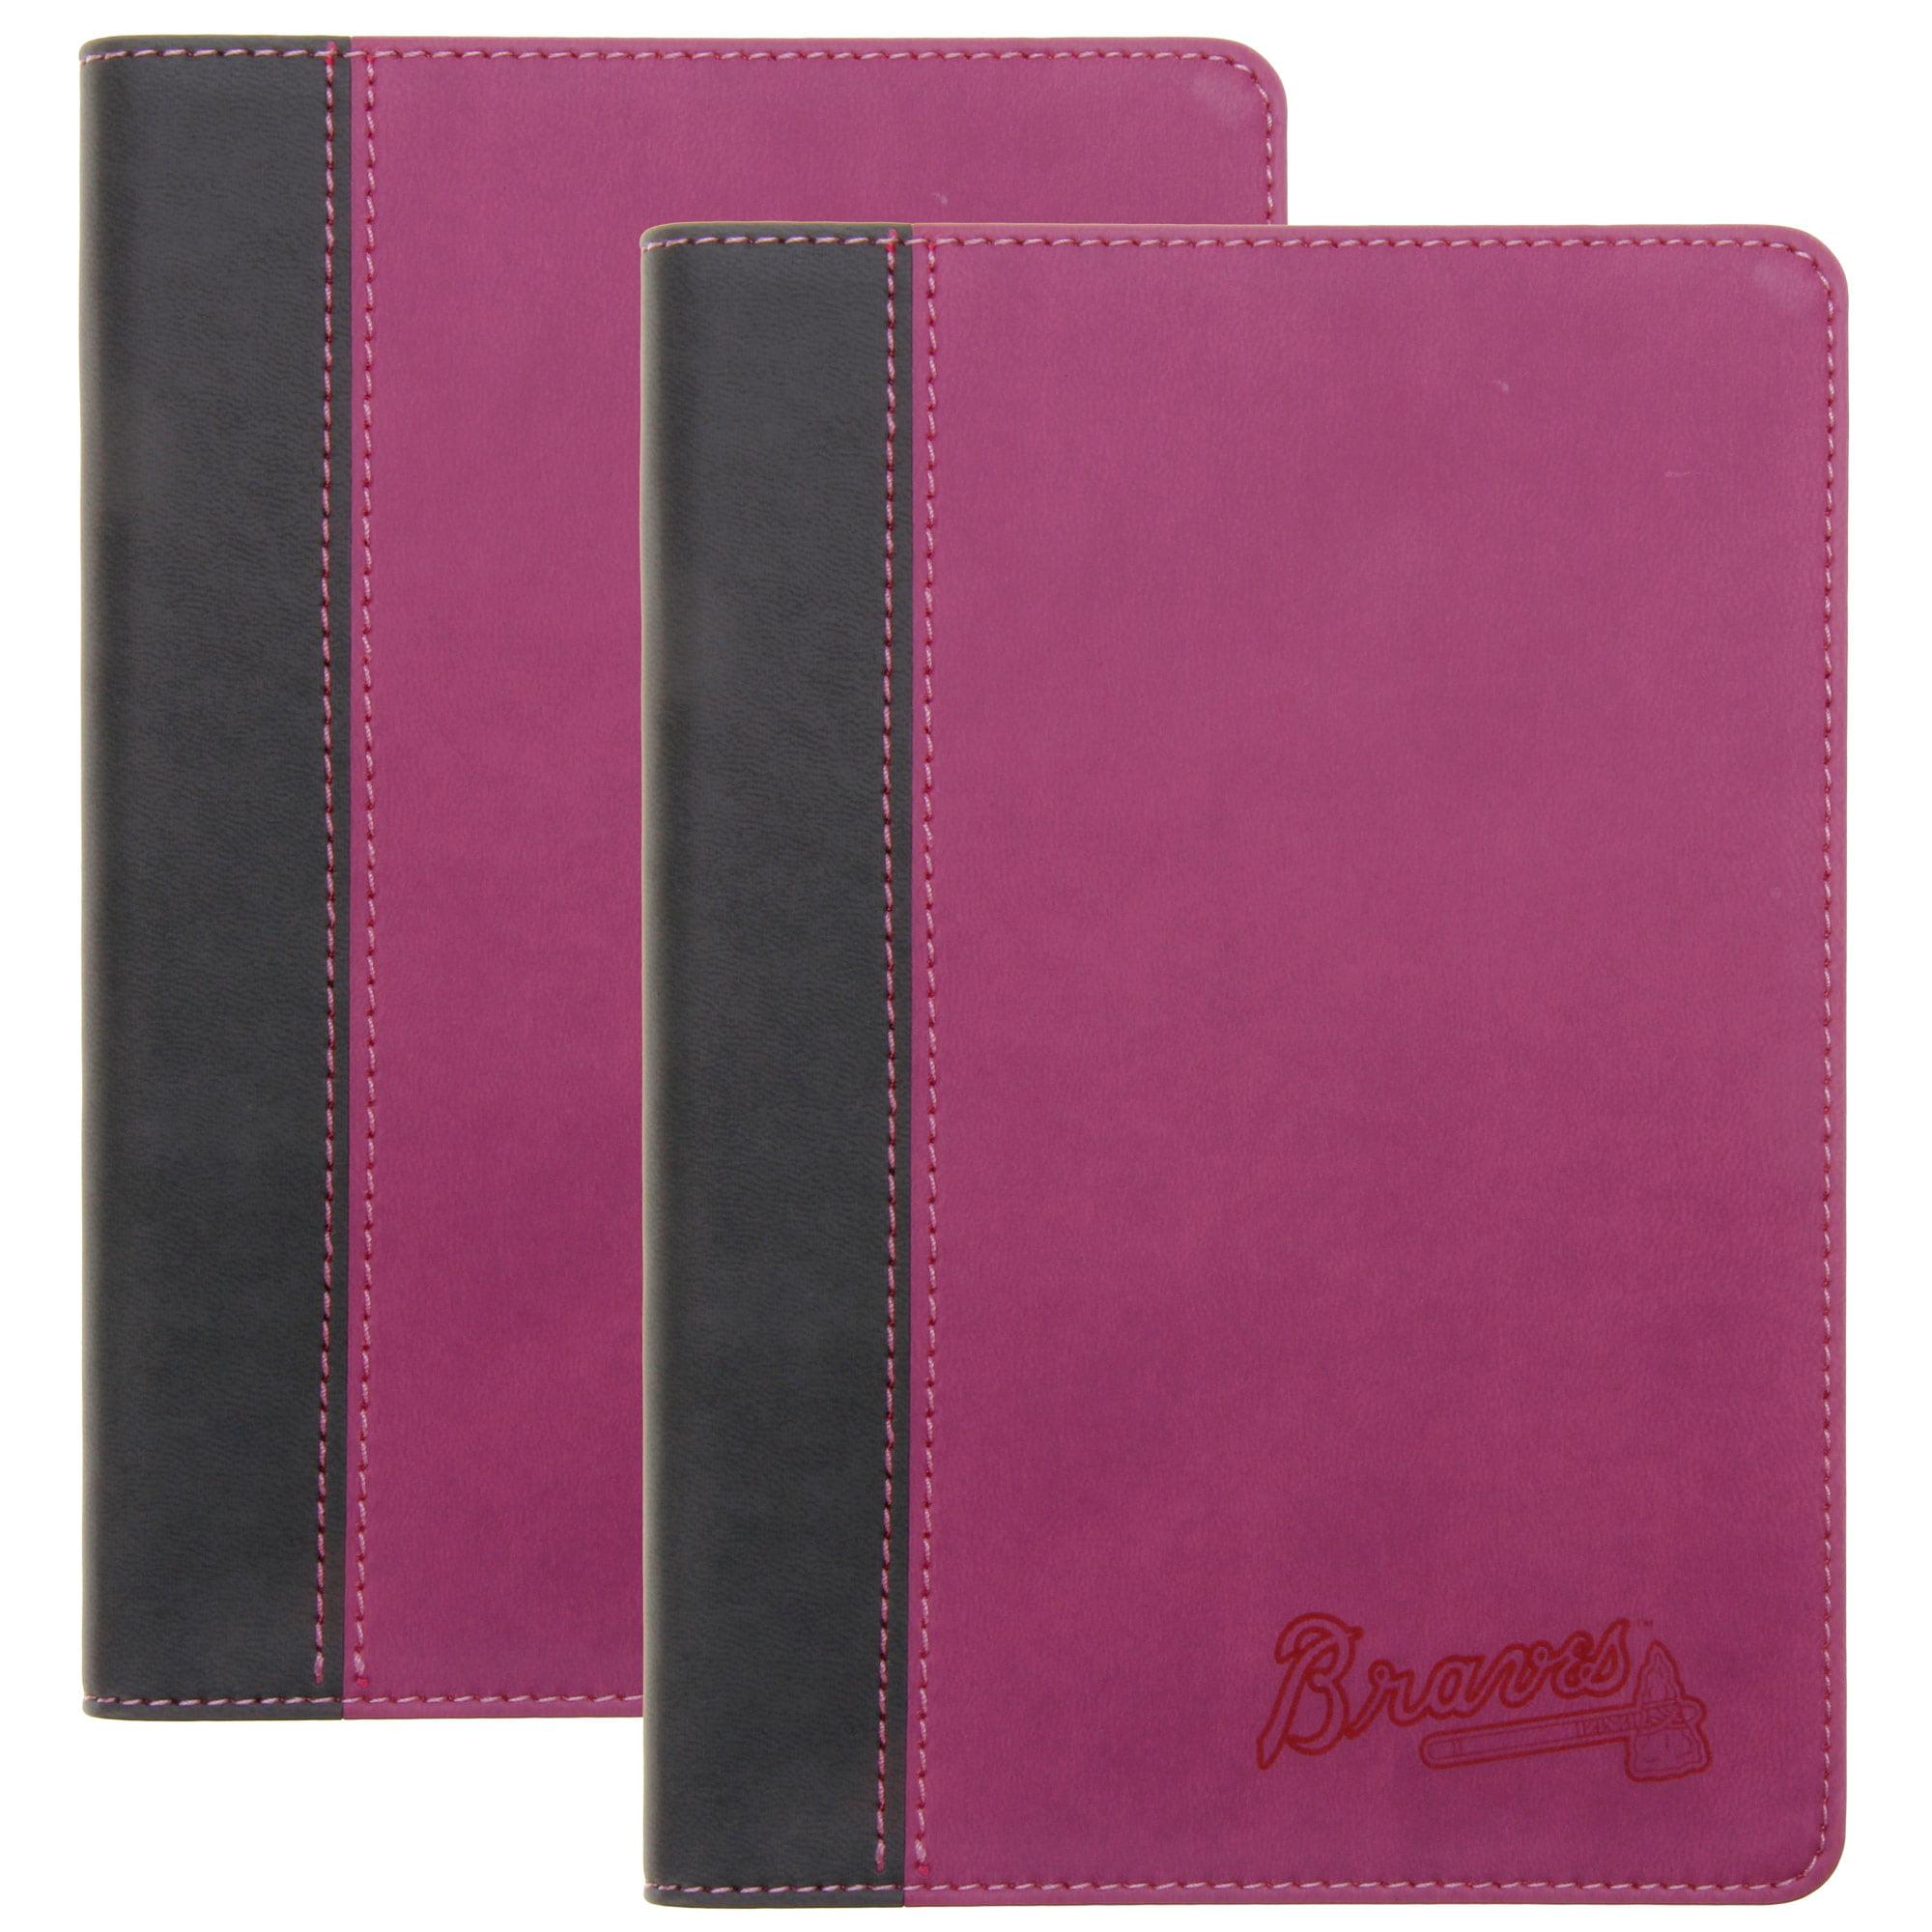 Atlanta Braves Journal 2-Pack - Pink - No Size